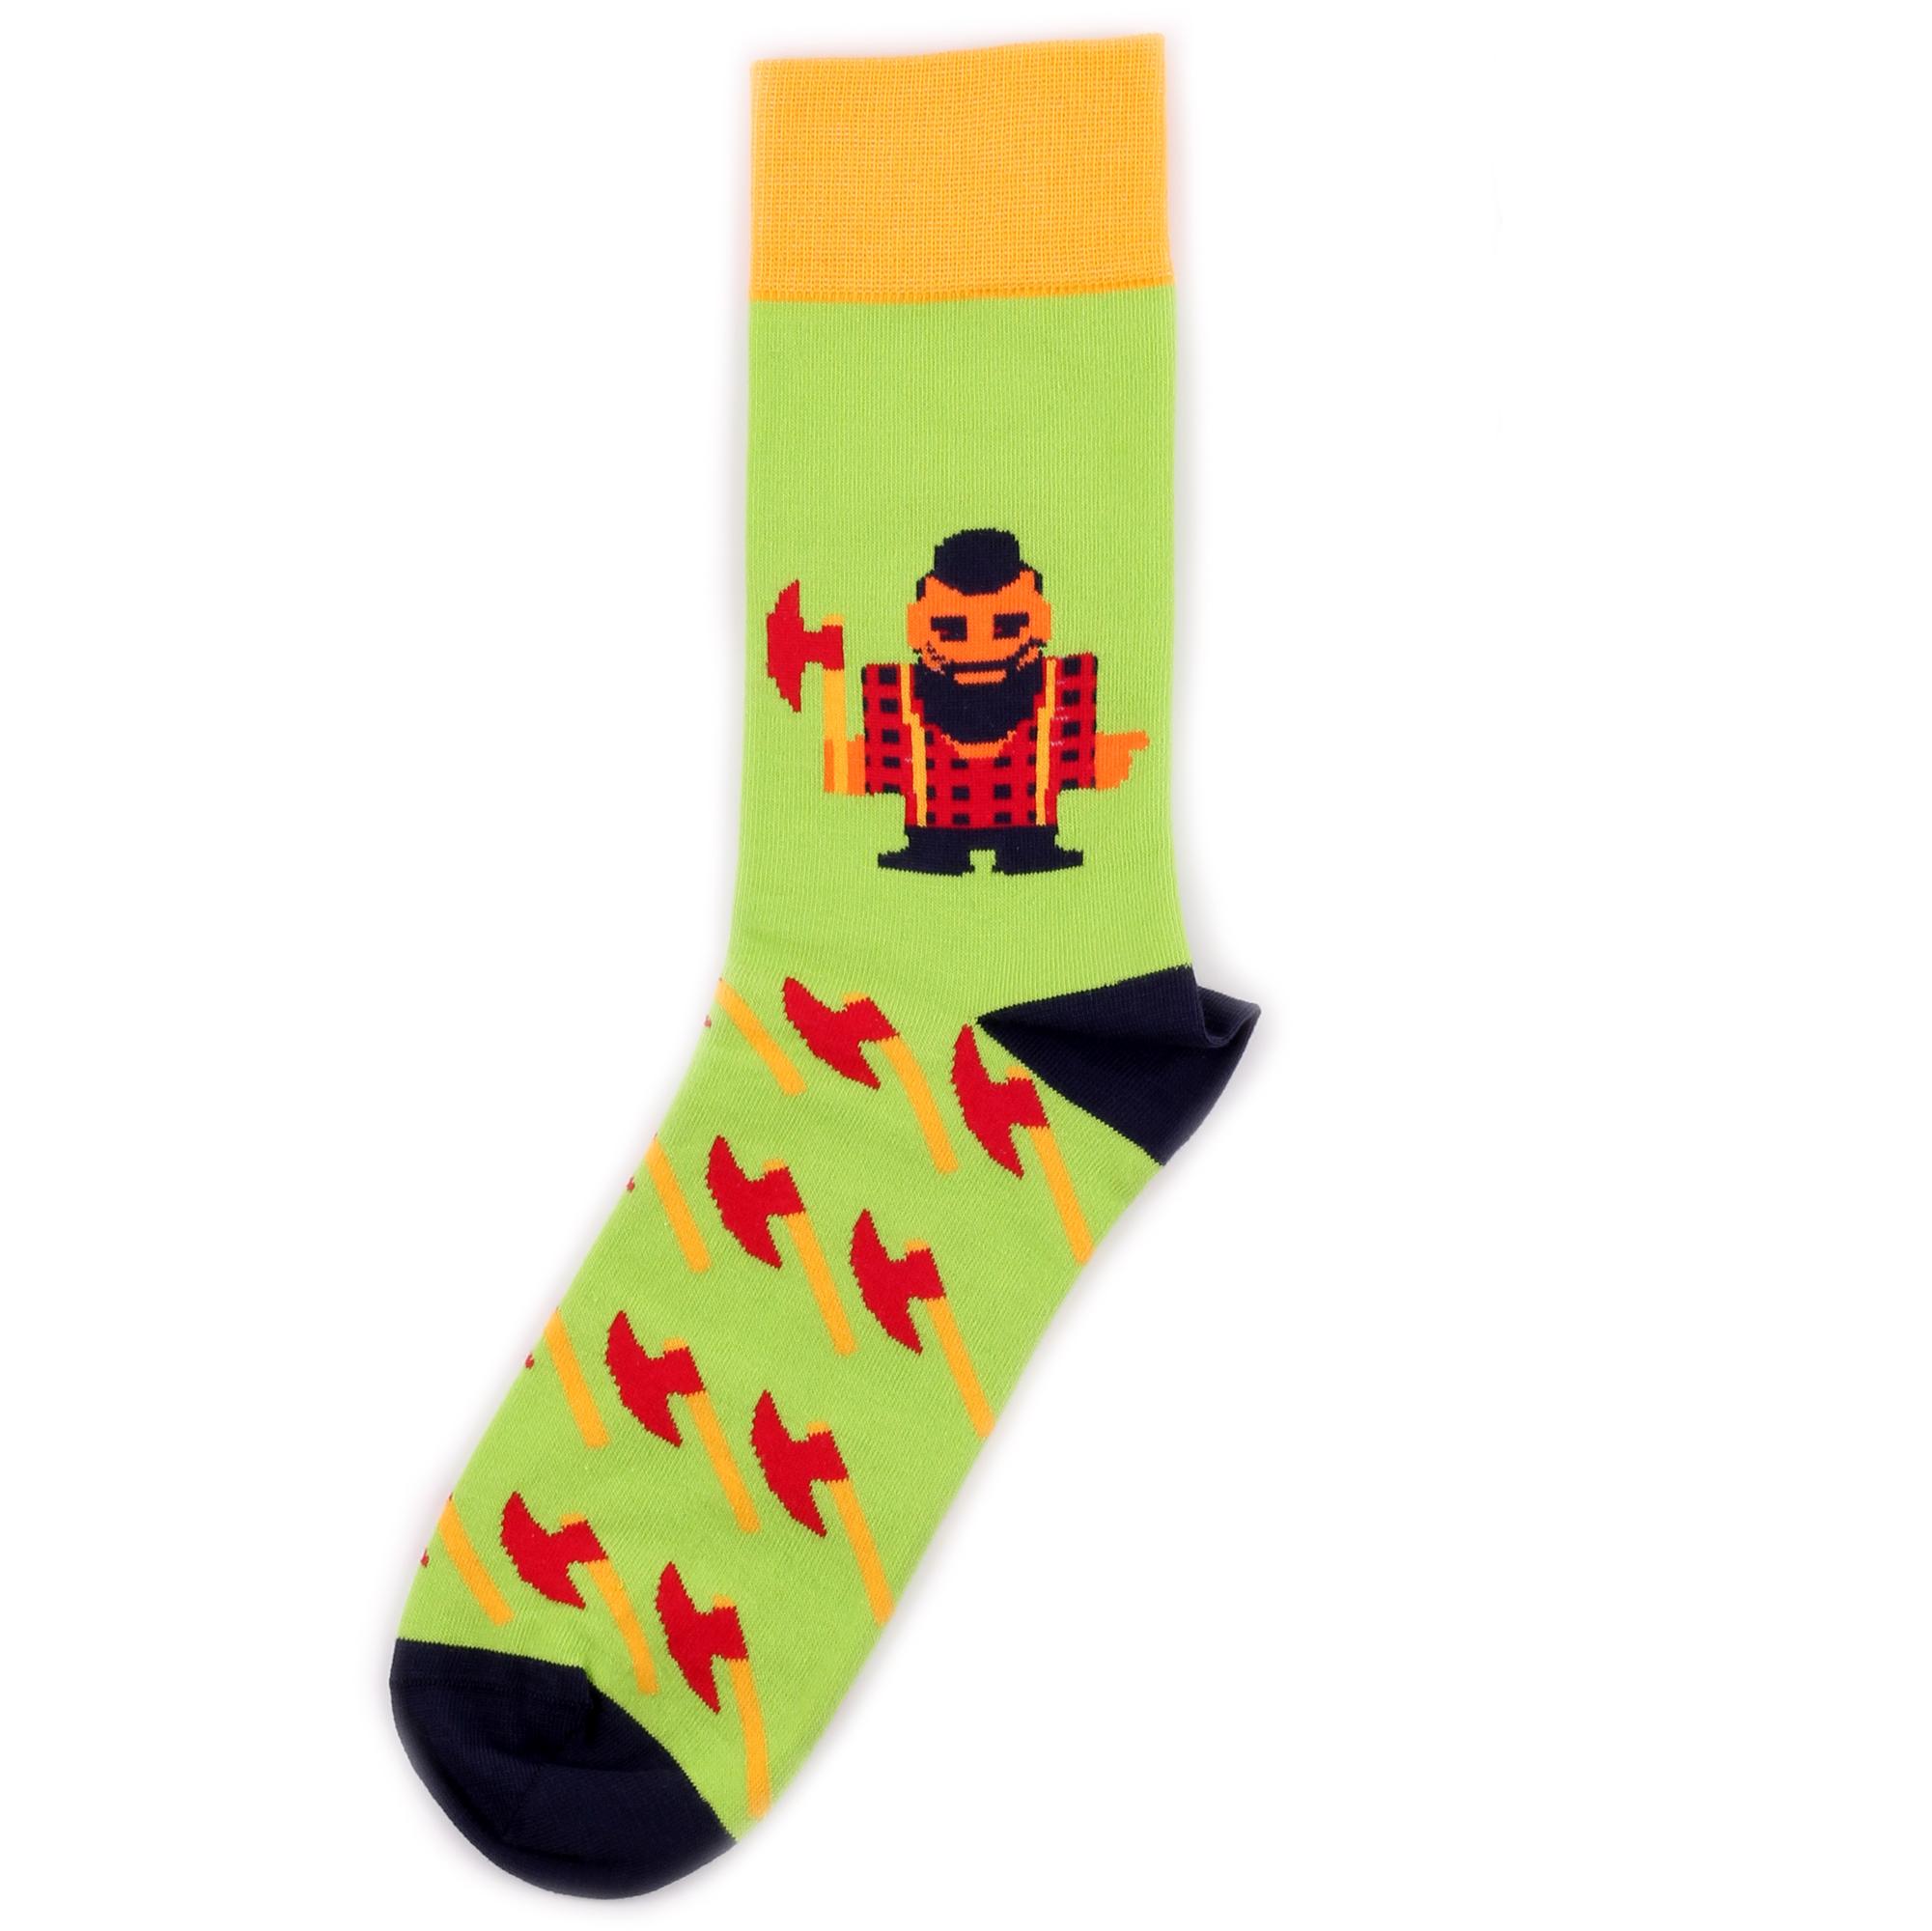 Носки унисекс St.Friday Socks BH_LumberjackGreen разноцветные 42-46